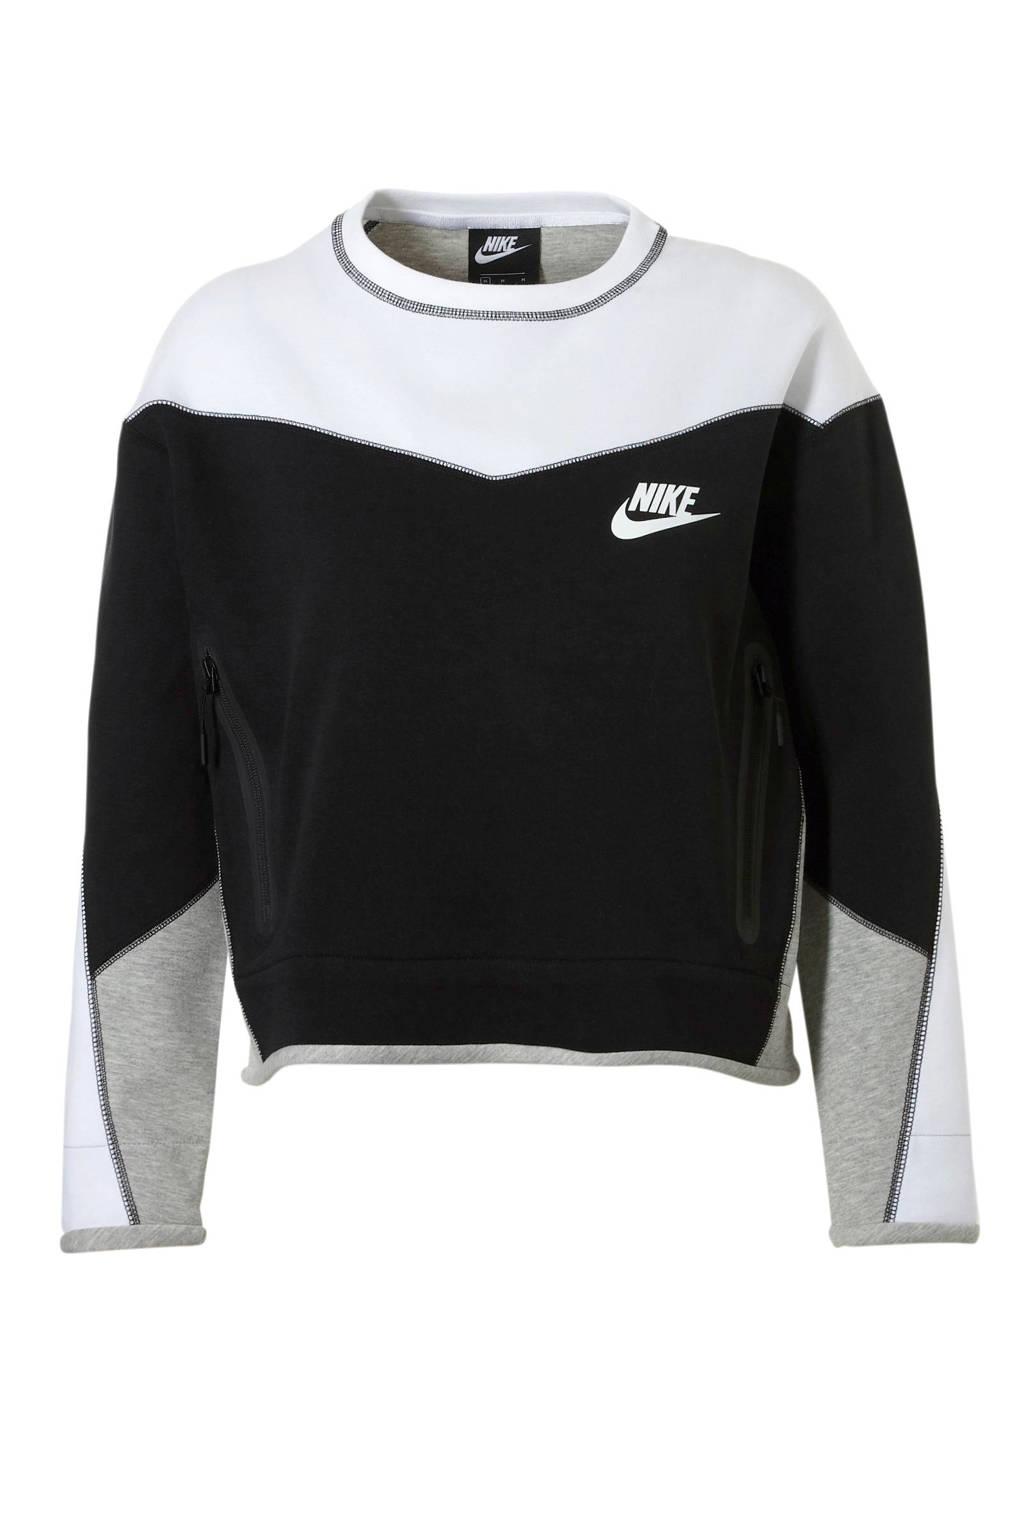 Nike sweater zwart/wit, Zwart/wit